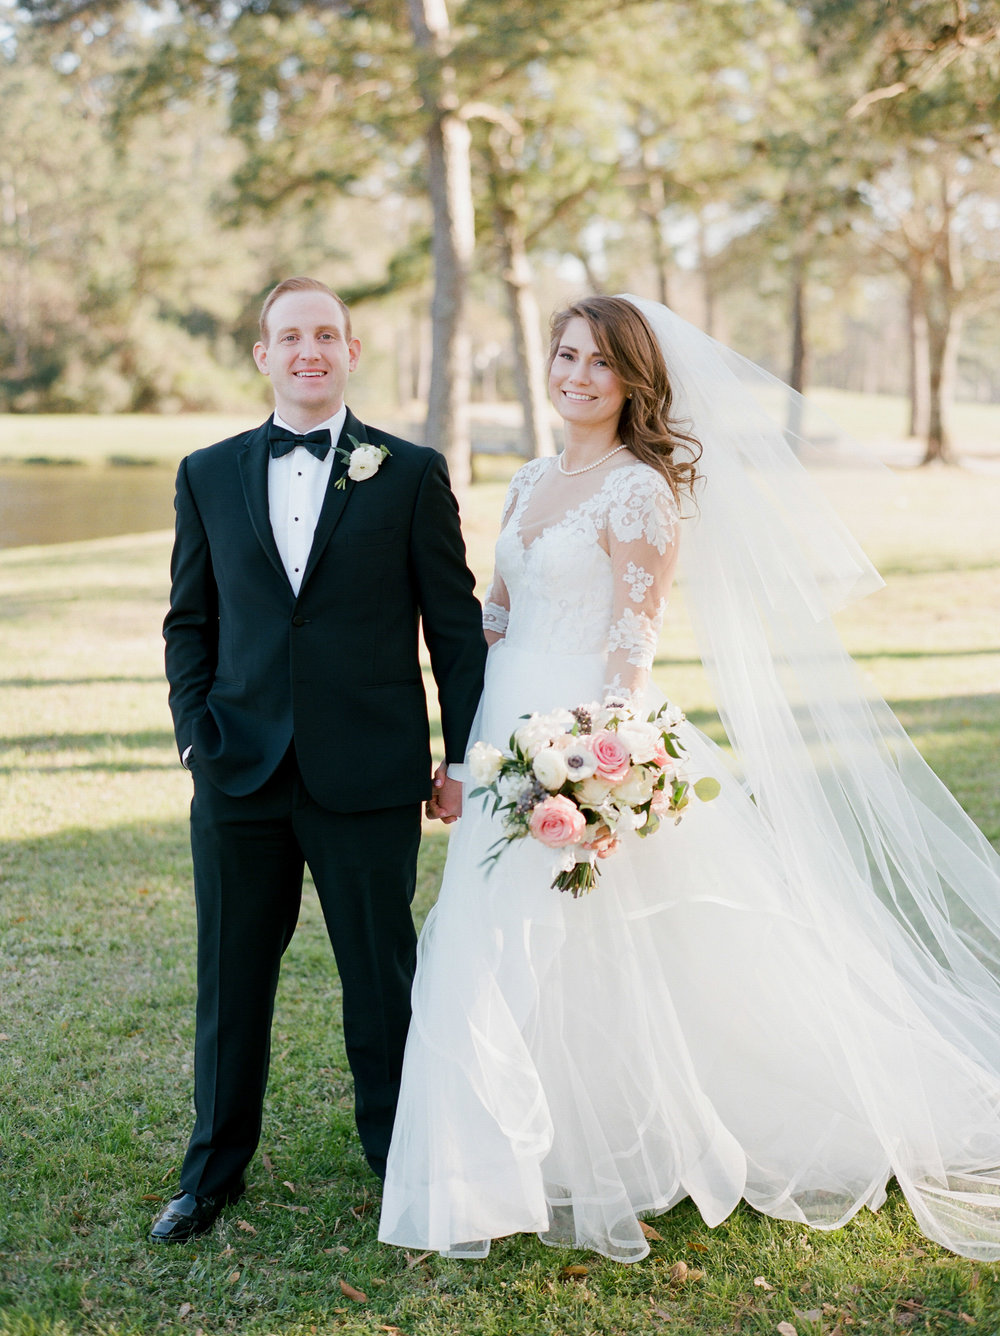 Houston-Wedding-Photographer-Style-Me-Pretty-St-Anne-Catholic-Church-Wedding-The-Woodlands-Country-Club-Palmer-Course-Austin-Wedding-photographer-fine-art-film-21.jpg